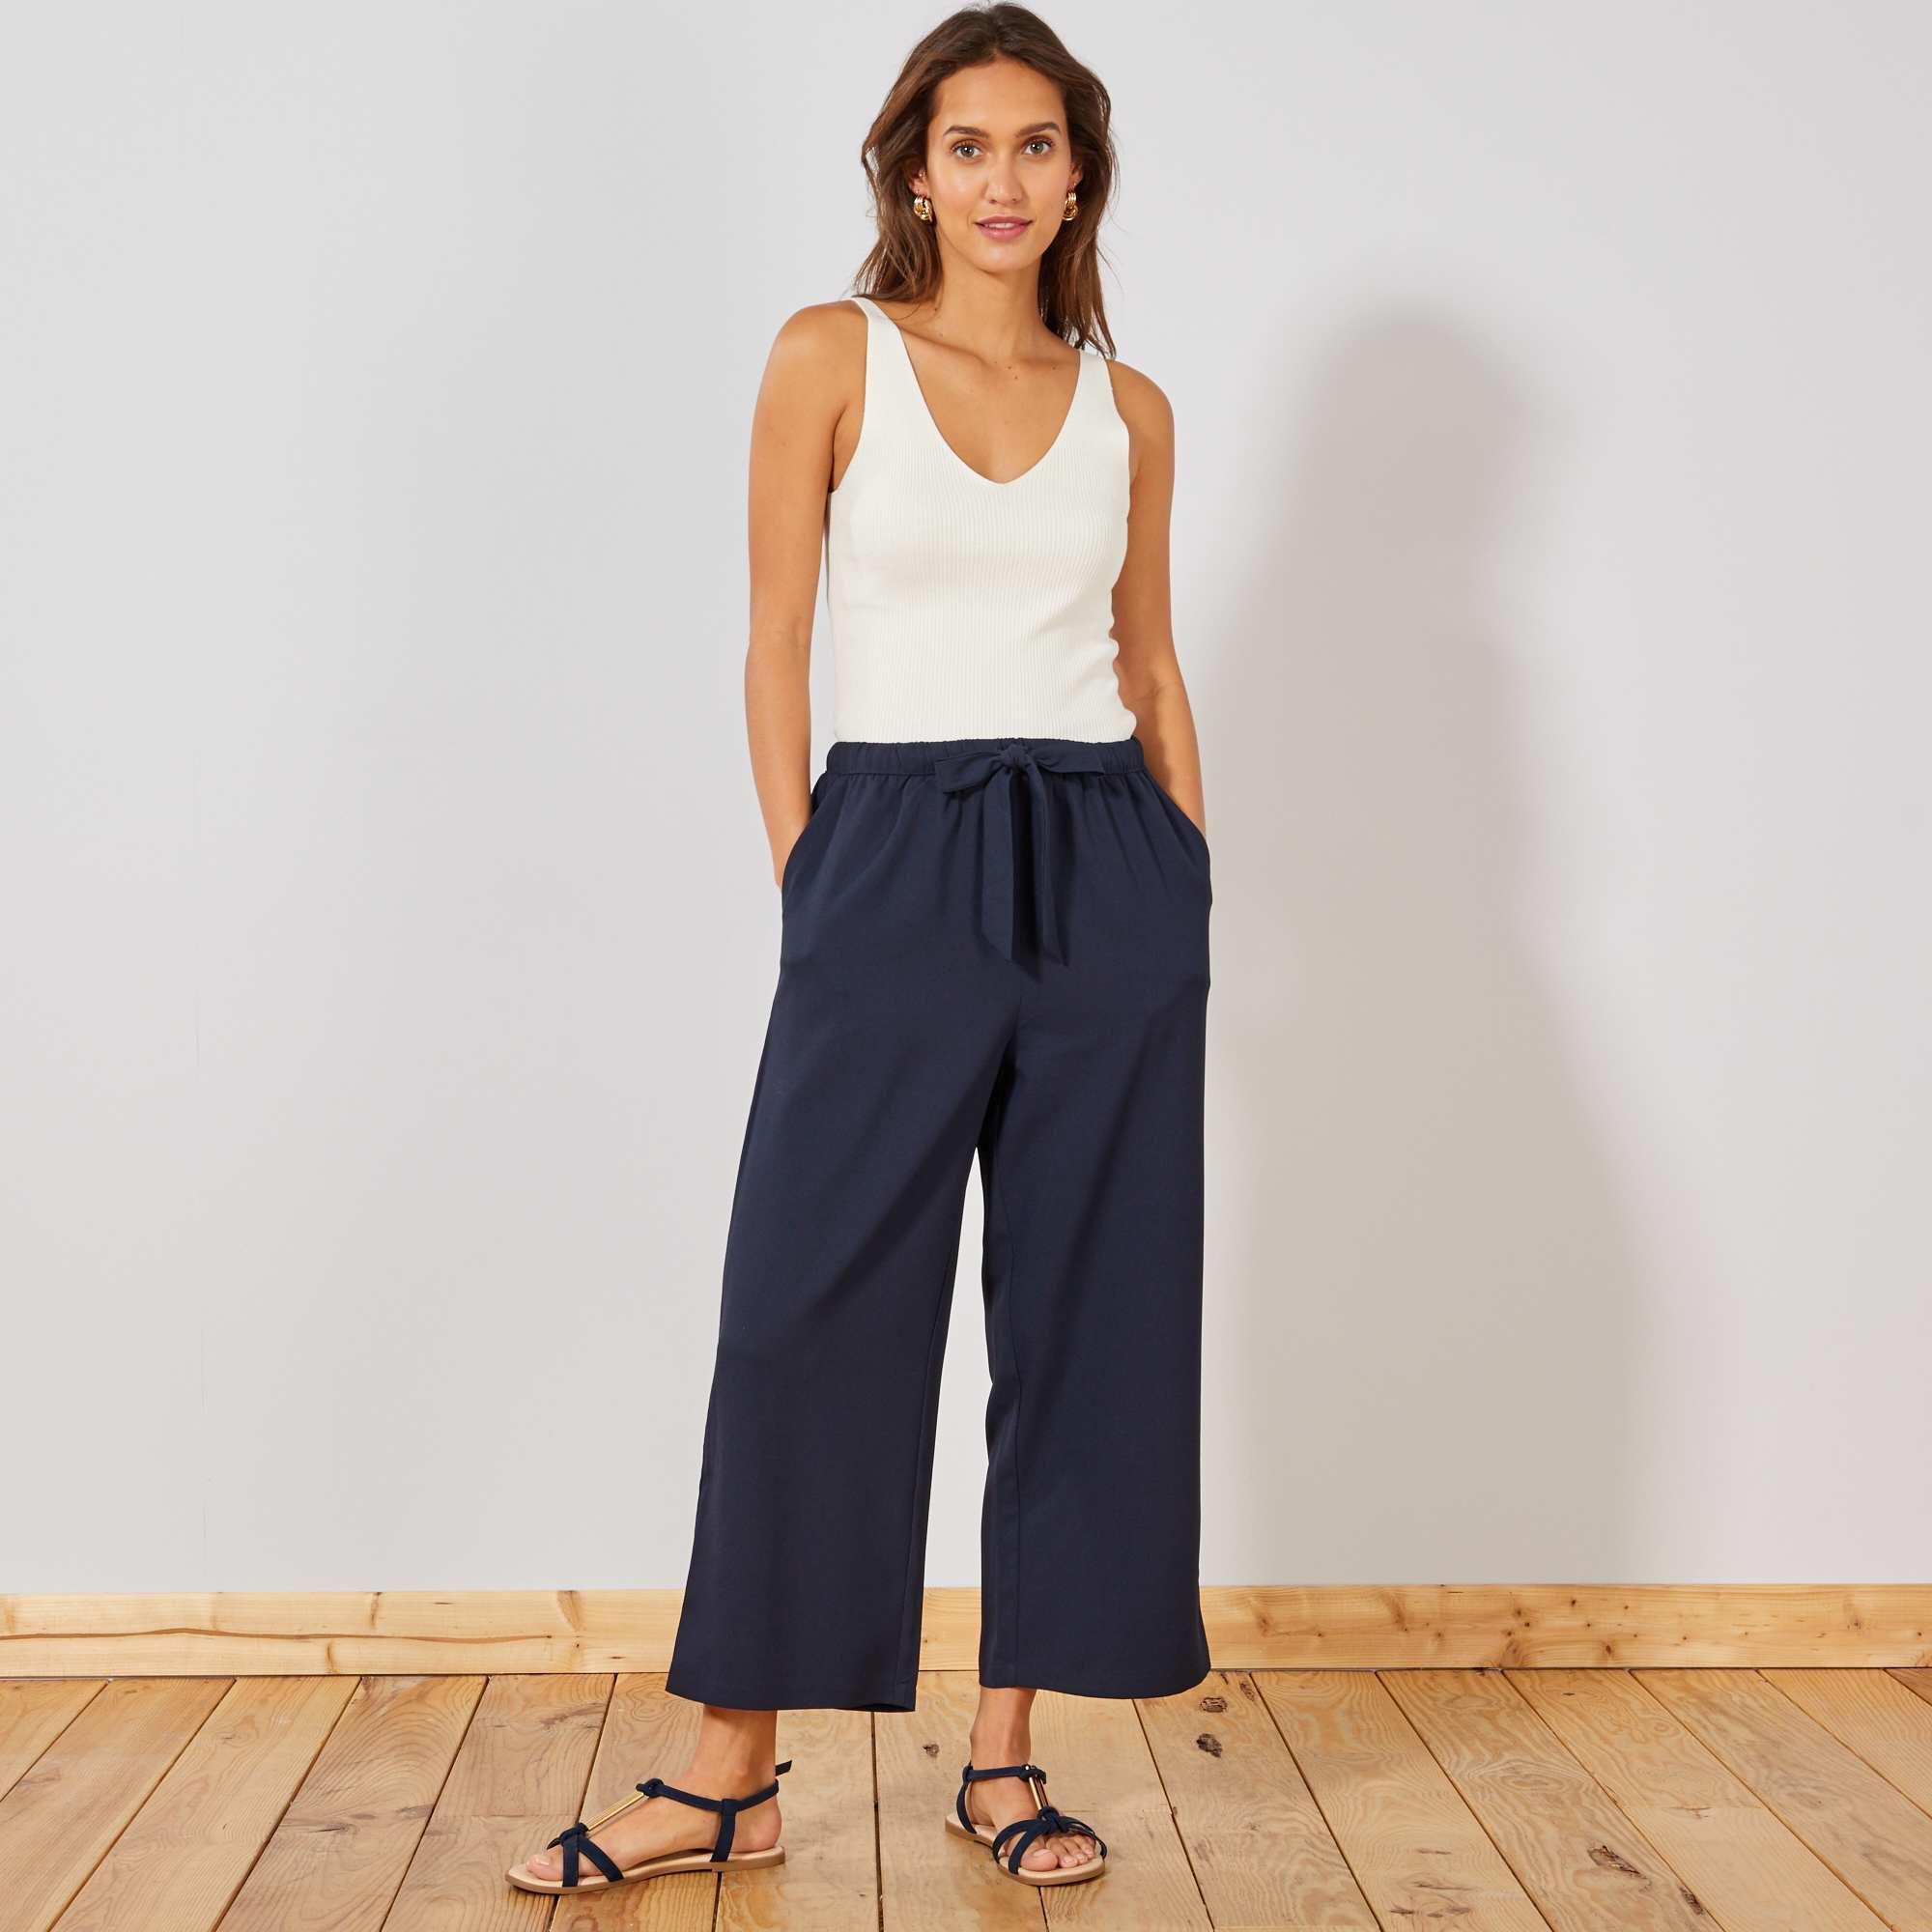 pantalon large fluide 7 8 me femme kiabi 15 00. Black Bedroom Furniture Sets. Home Design Ideas